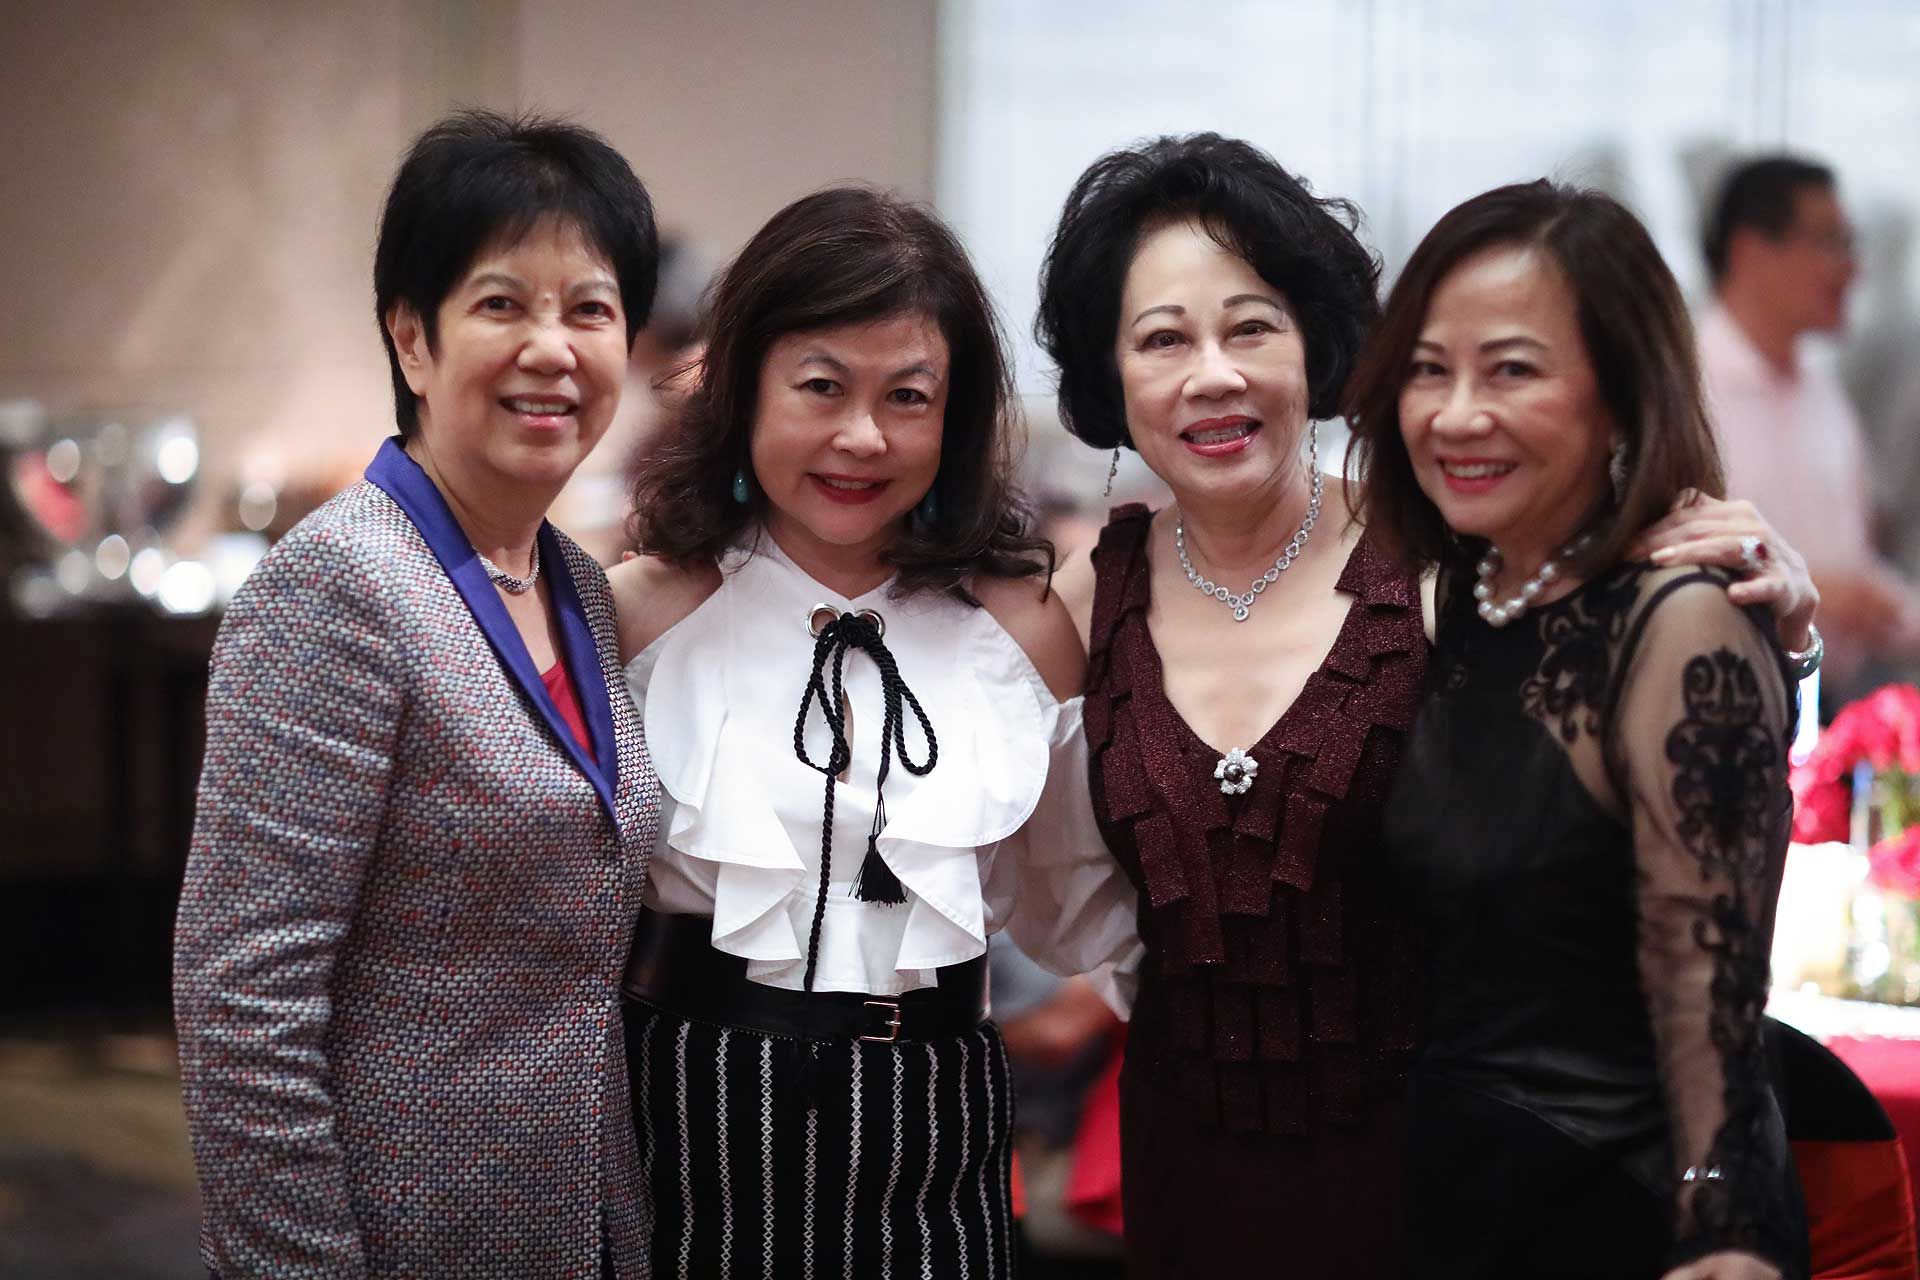 Chan Mo Lin, Chan Yue Yee, Dr Ann Chan and Molly Lim